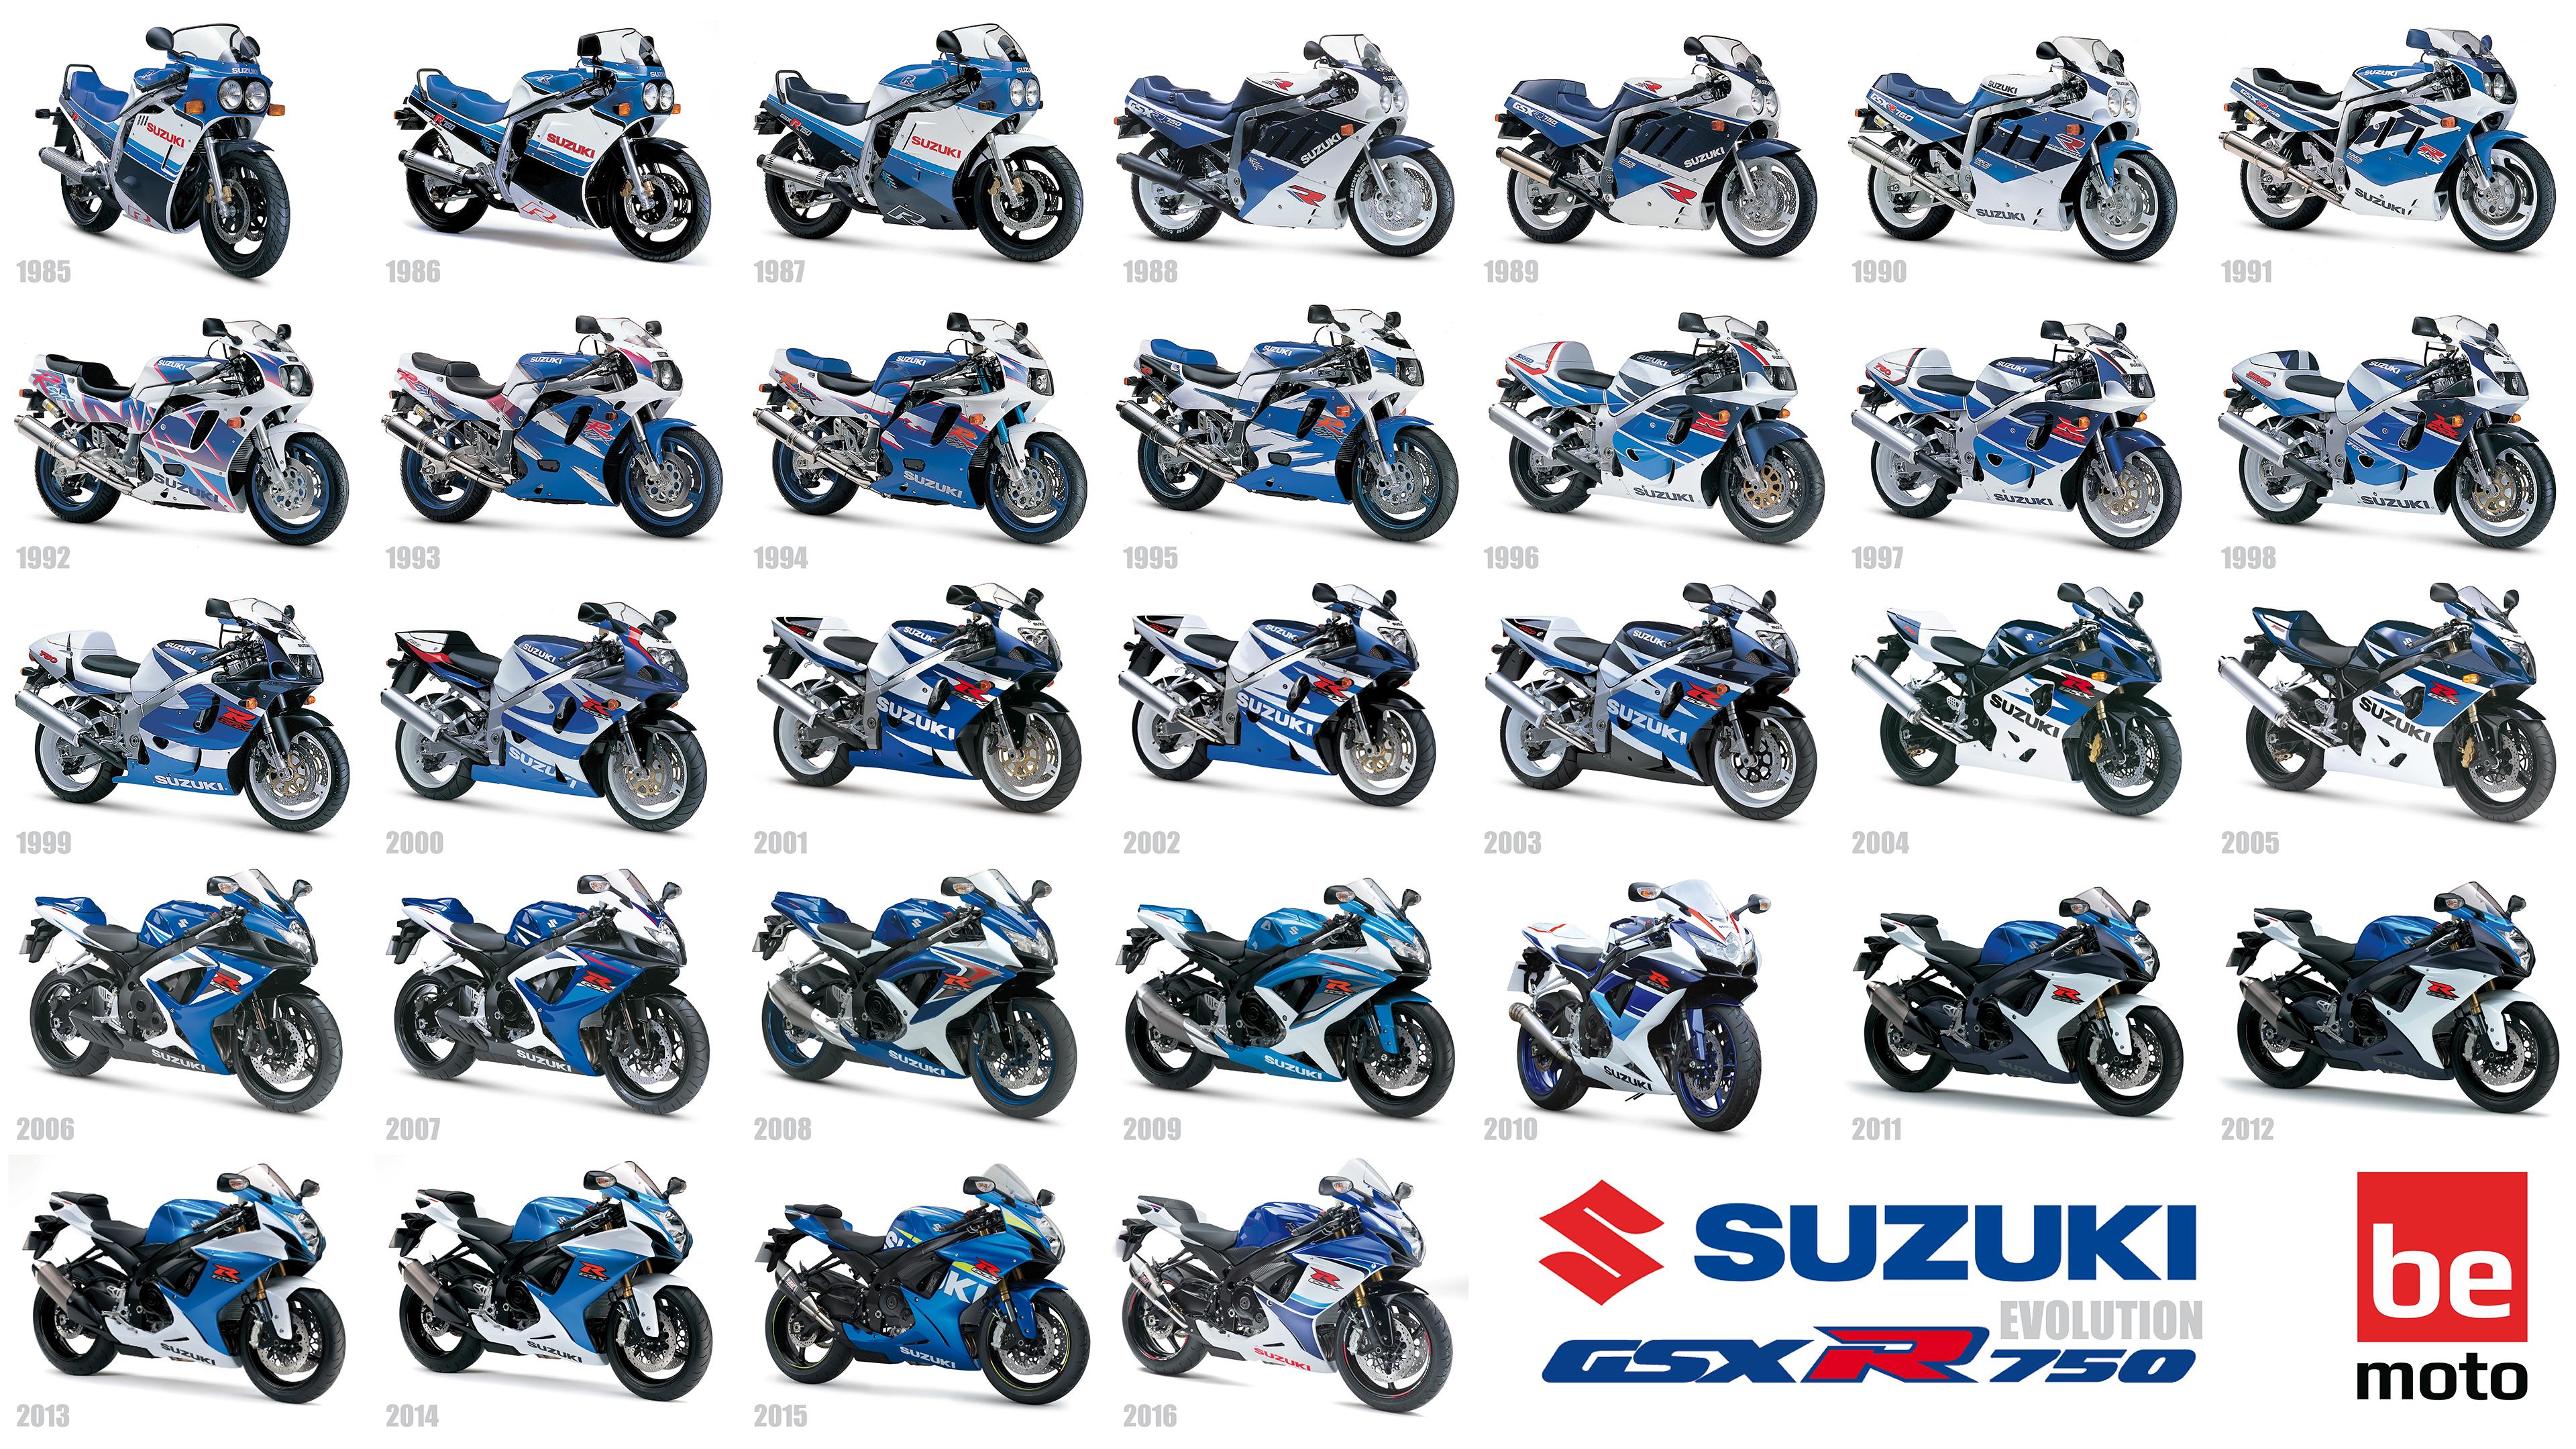 Suzuki History